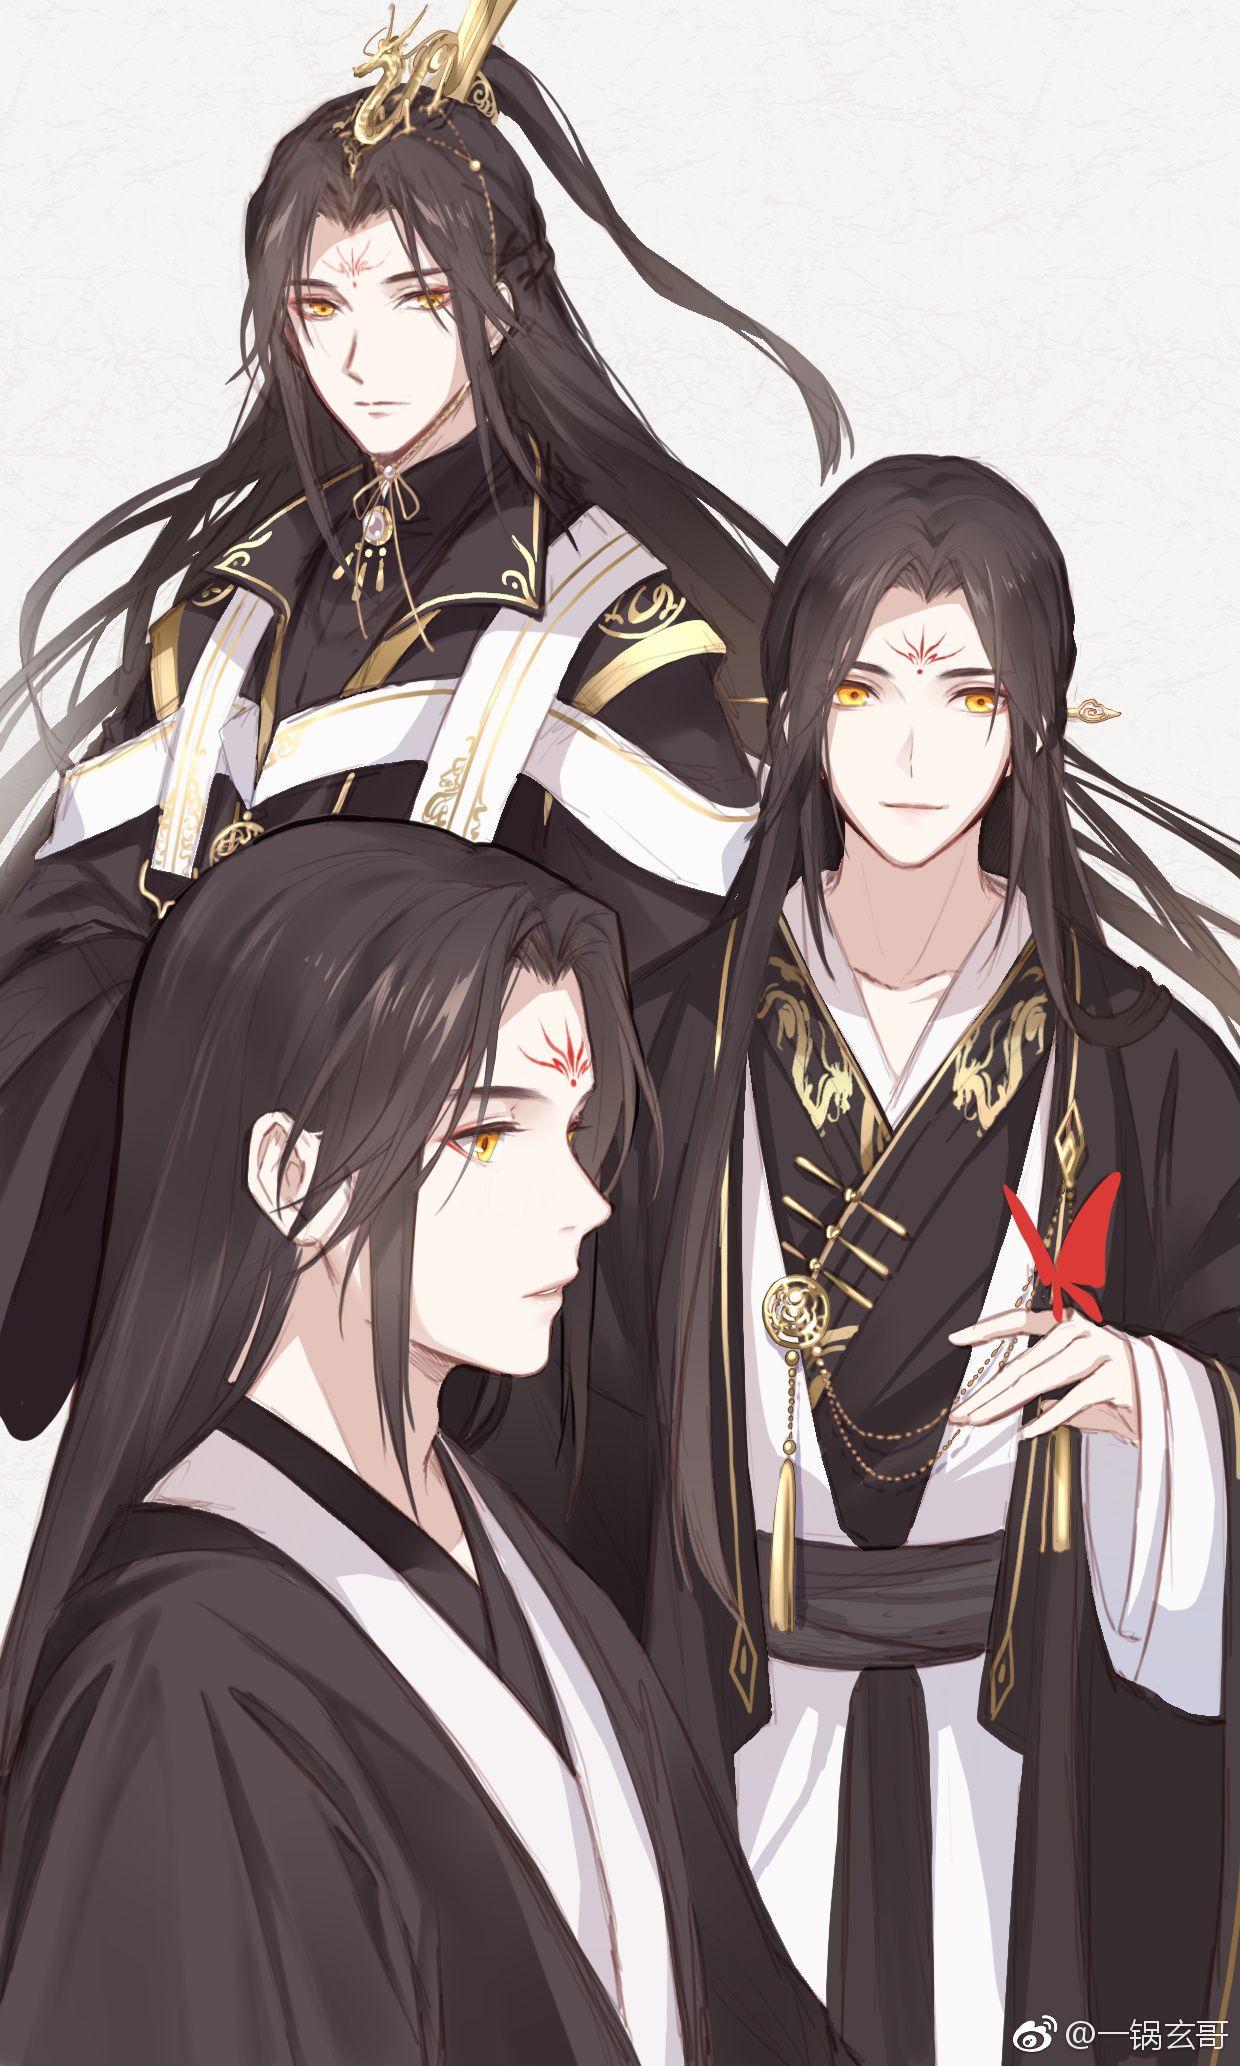 Anime Boy Male Character, Black Long Hair, Orange Yellow